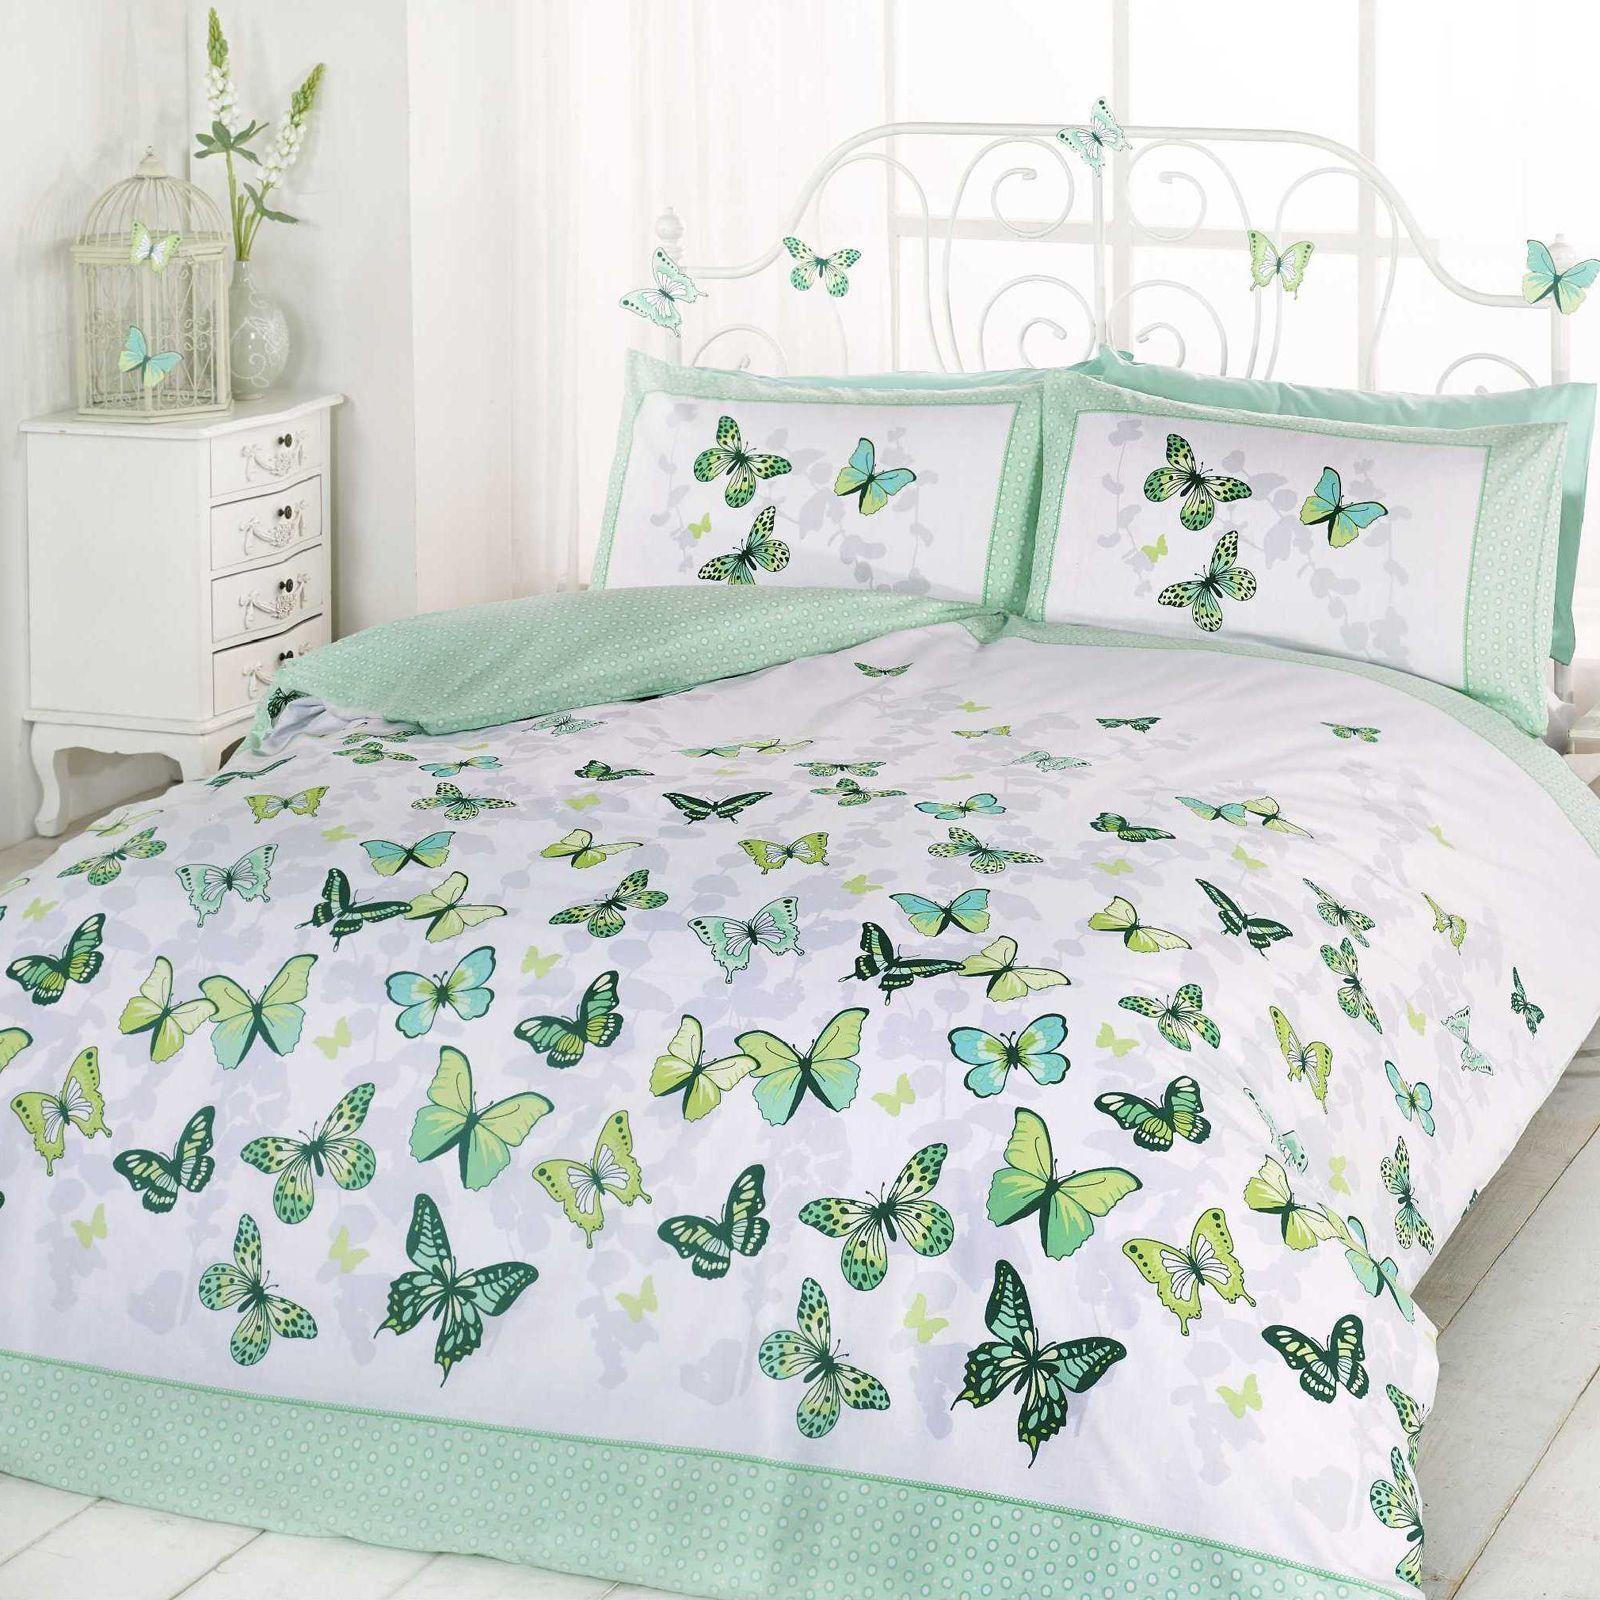 BUTTERFLY FLUTTER DOUBLE DUVET COVER AND PILLOWCASE SET GREEN WHITE BEDDING